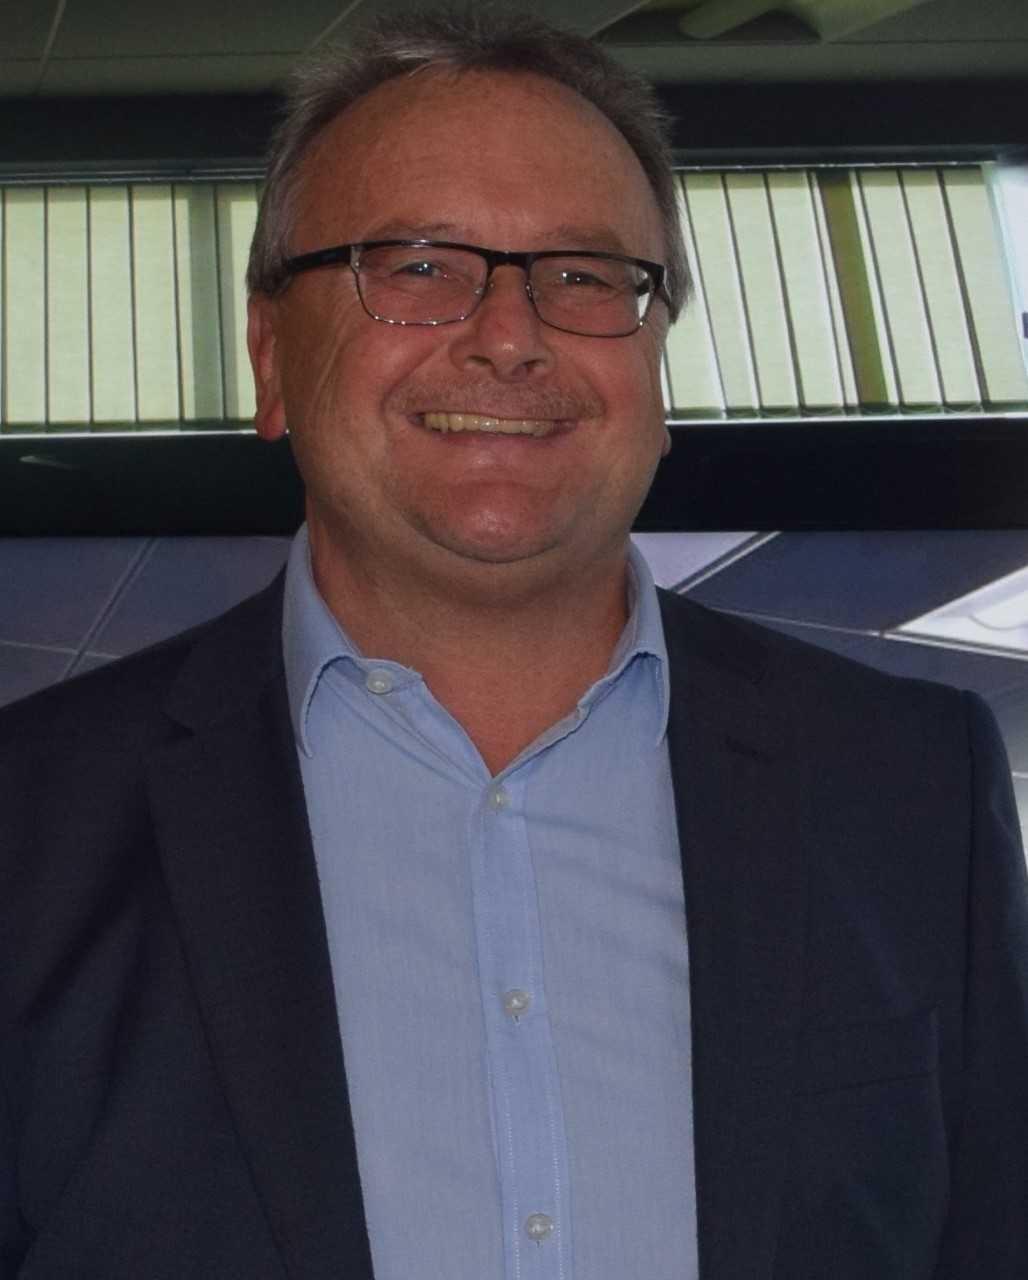 UVS Managing Director Steve Murphy